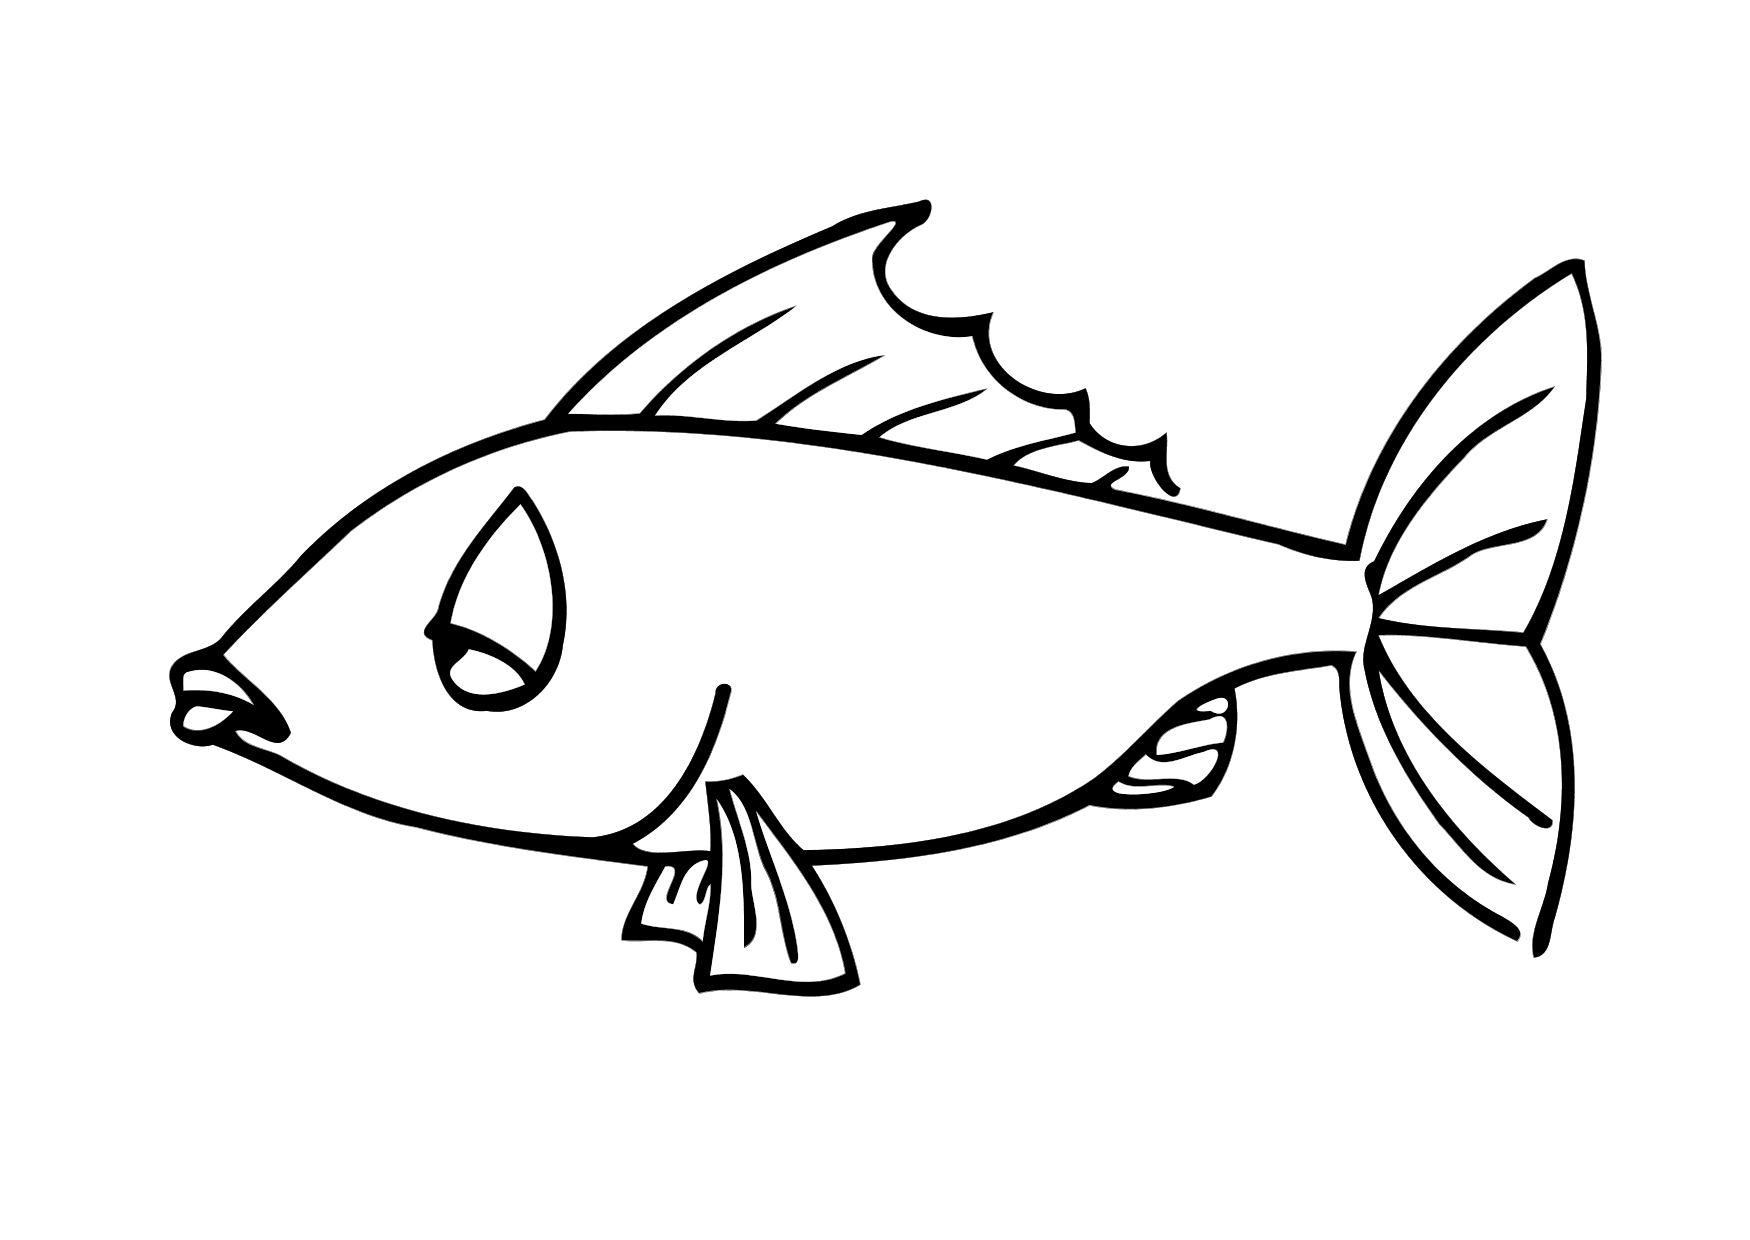 1750x1240 Koi Fish Coloring Page